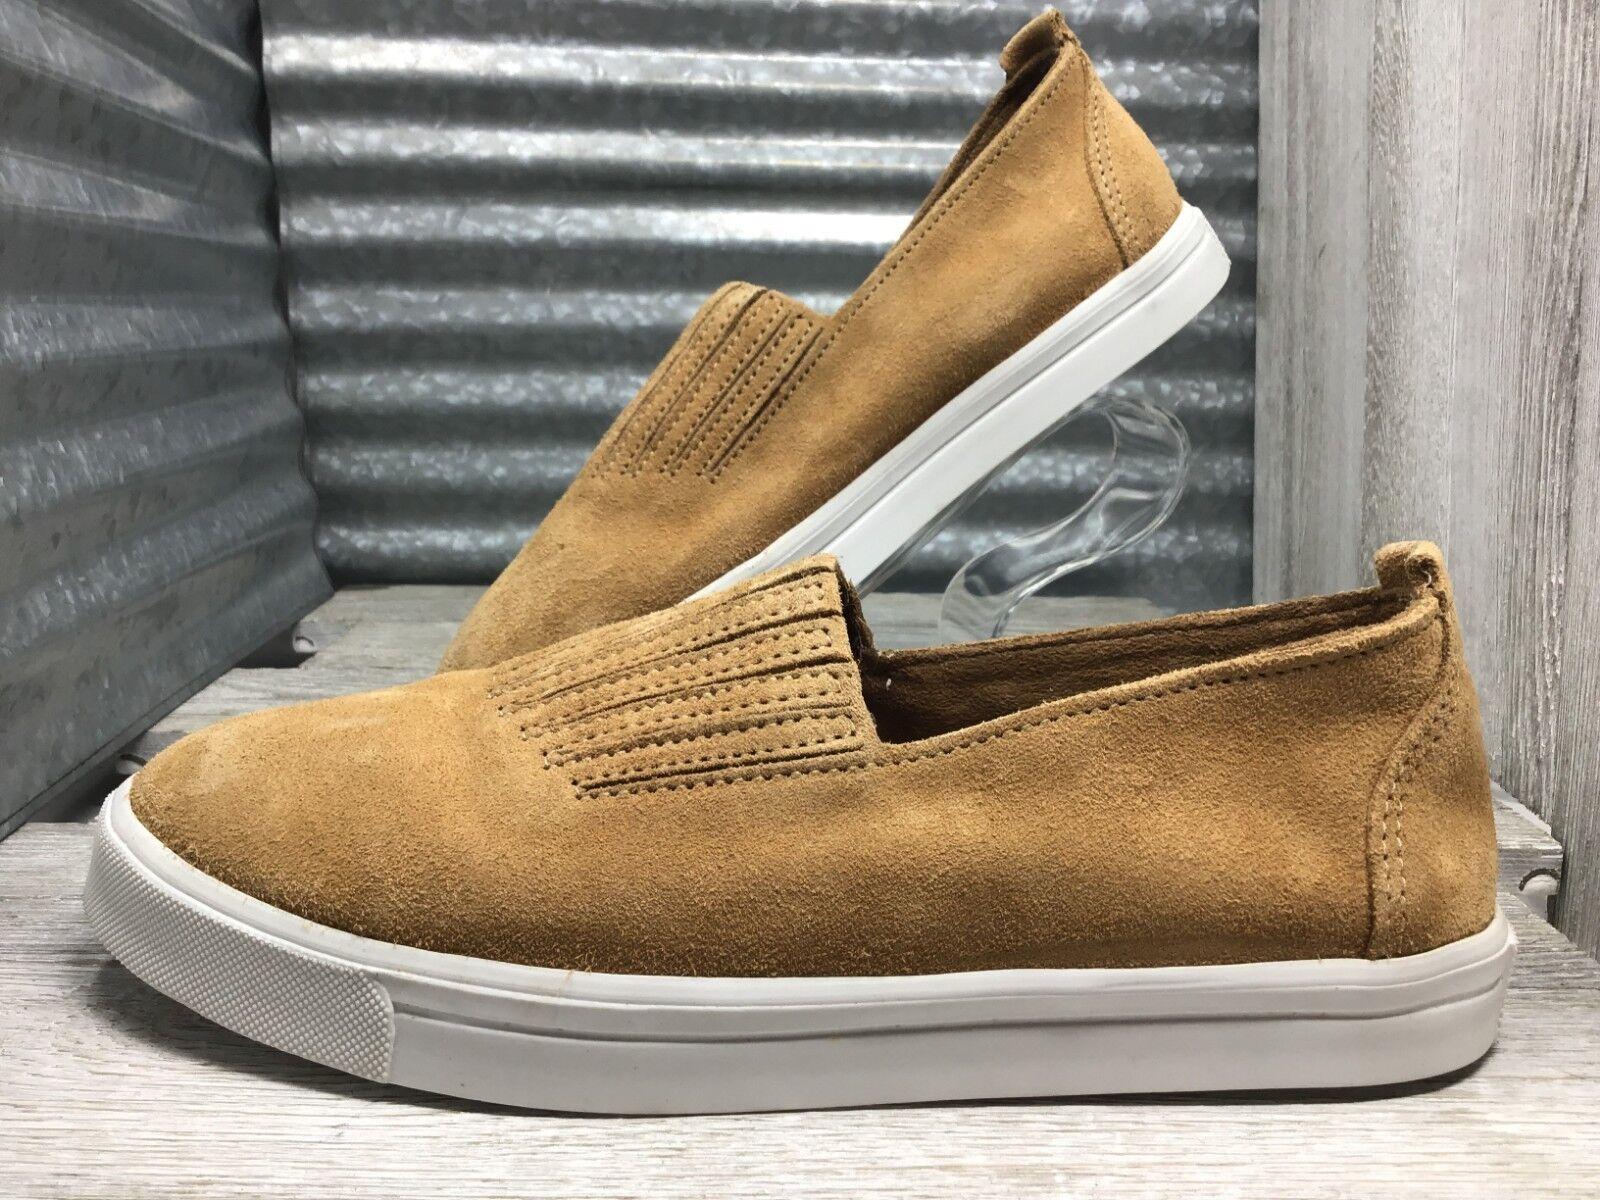 Minnetonka Gabi  Women's Size 8.5 Sneaker Taupe Suade Gored Elastic